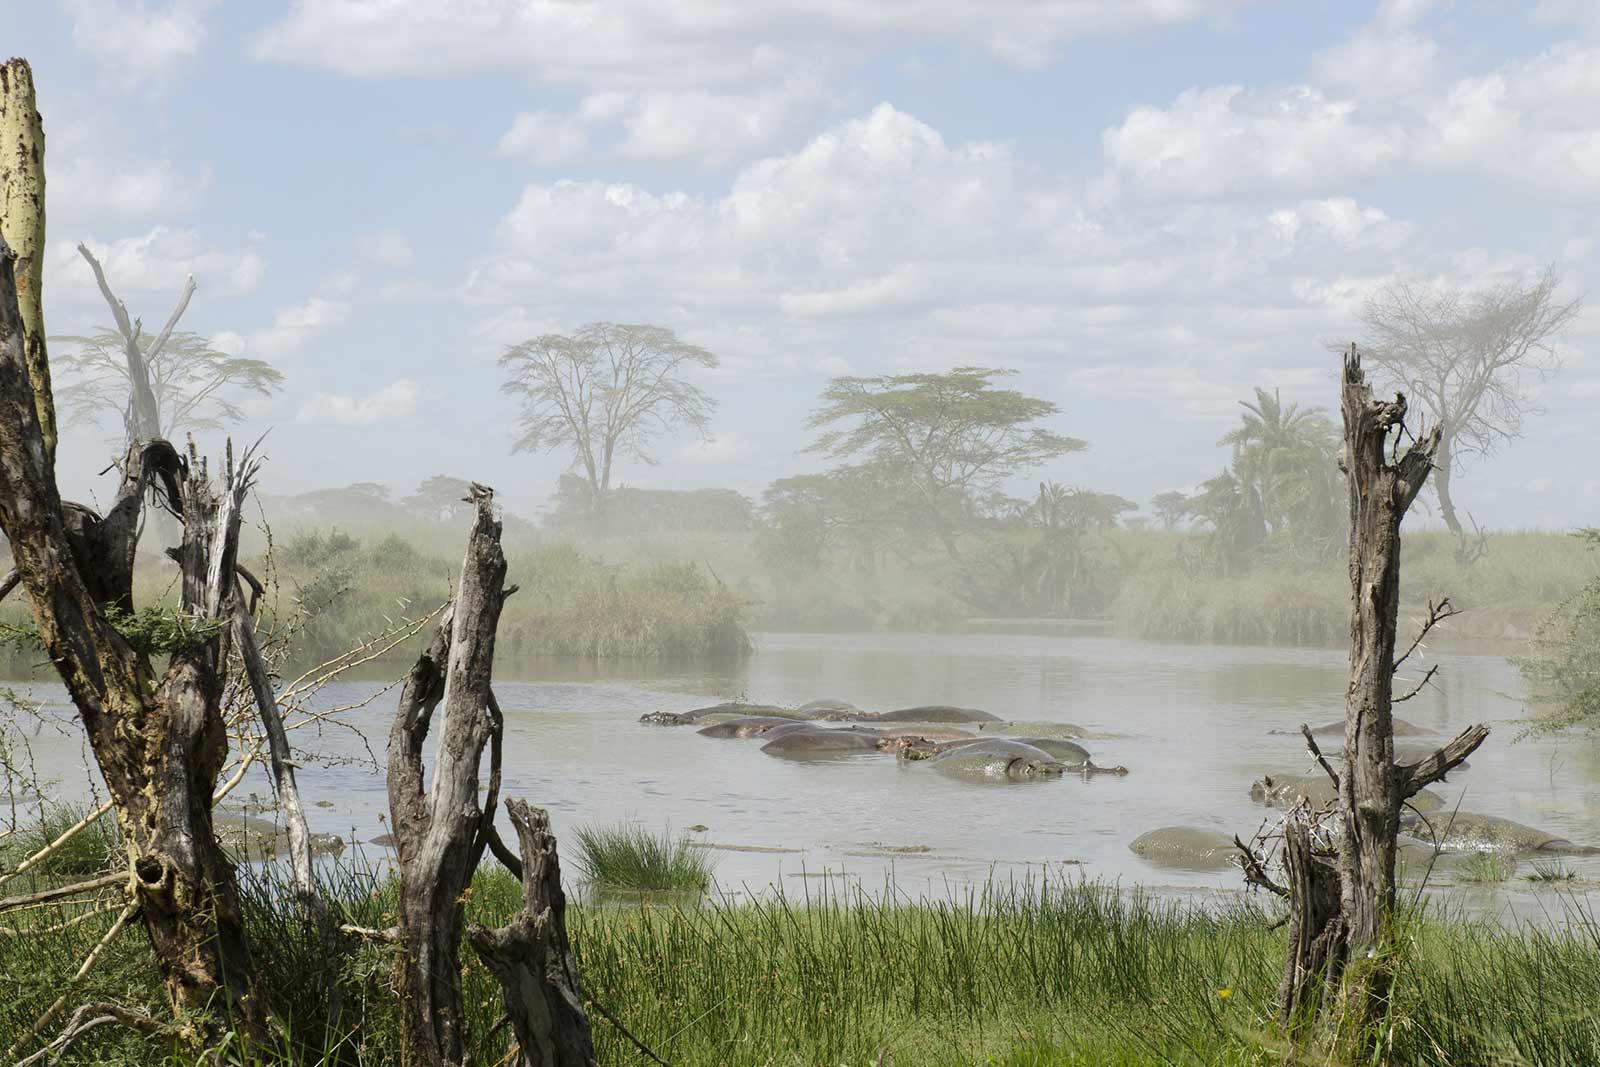 Hippos in uganda